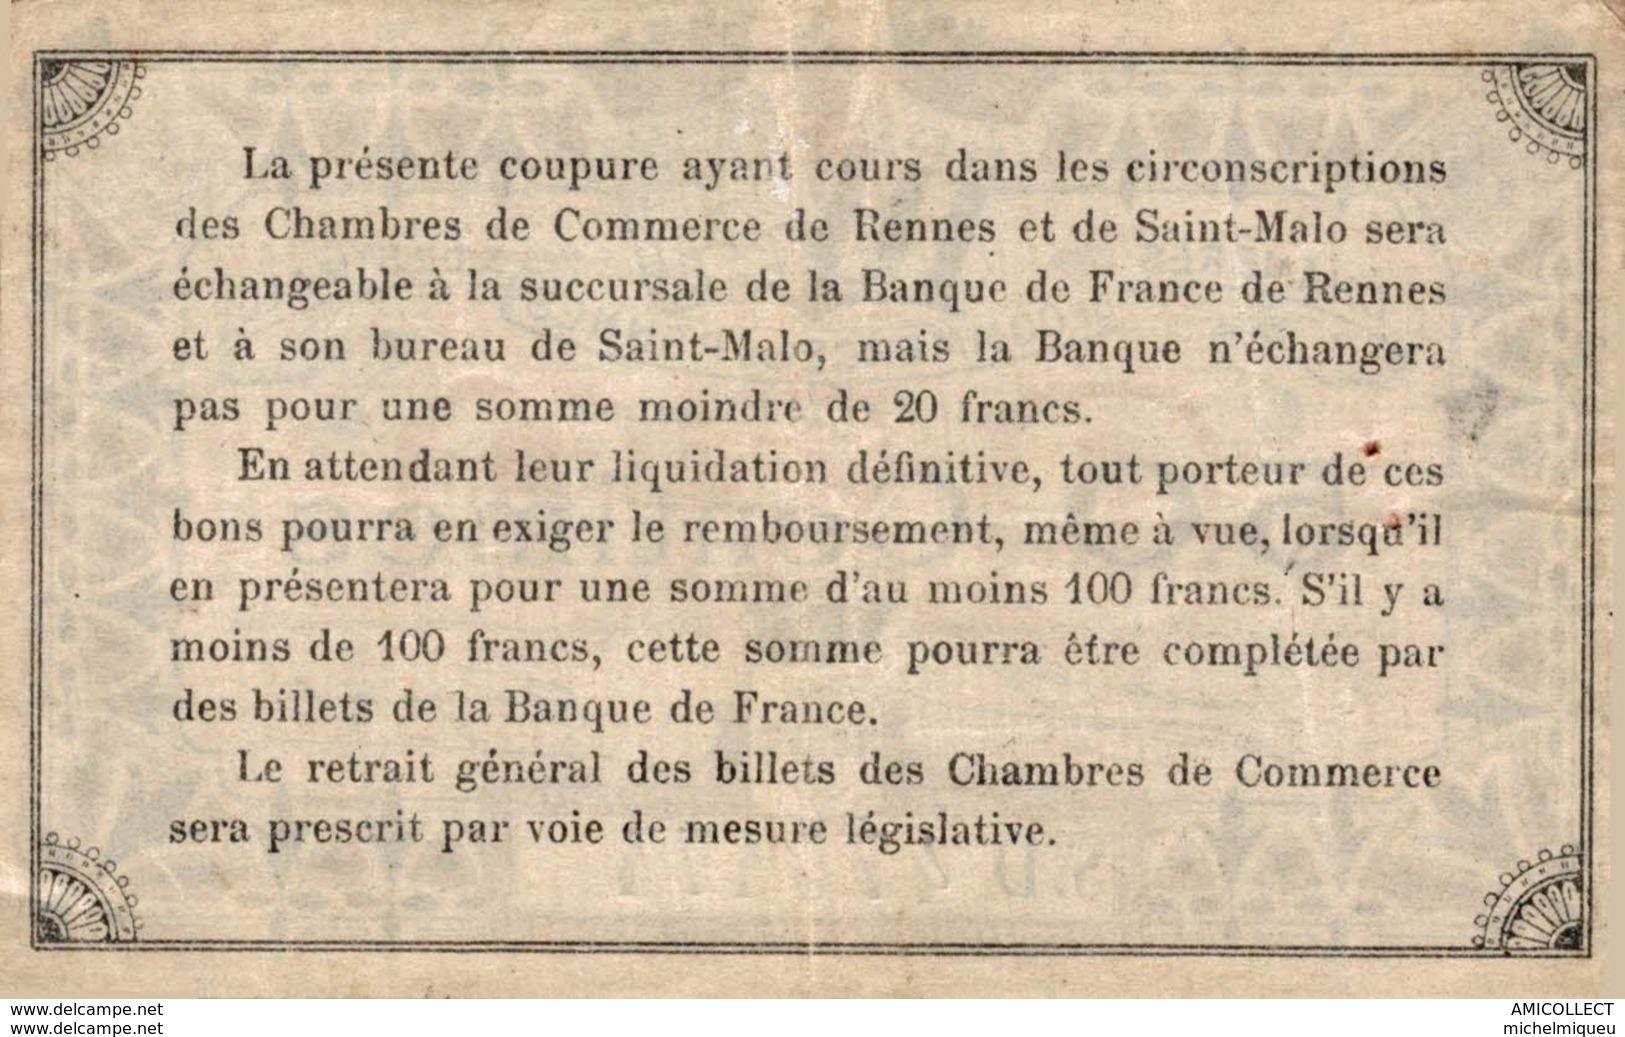 1320-2019     CHAMBRE DE COMMERCE DE RENNES ET DE SAINT MALO  50 CENTIMES - Camera Di Commercio